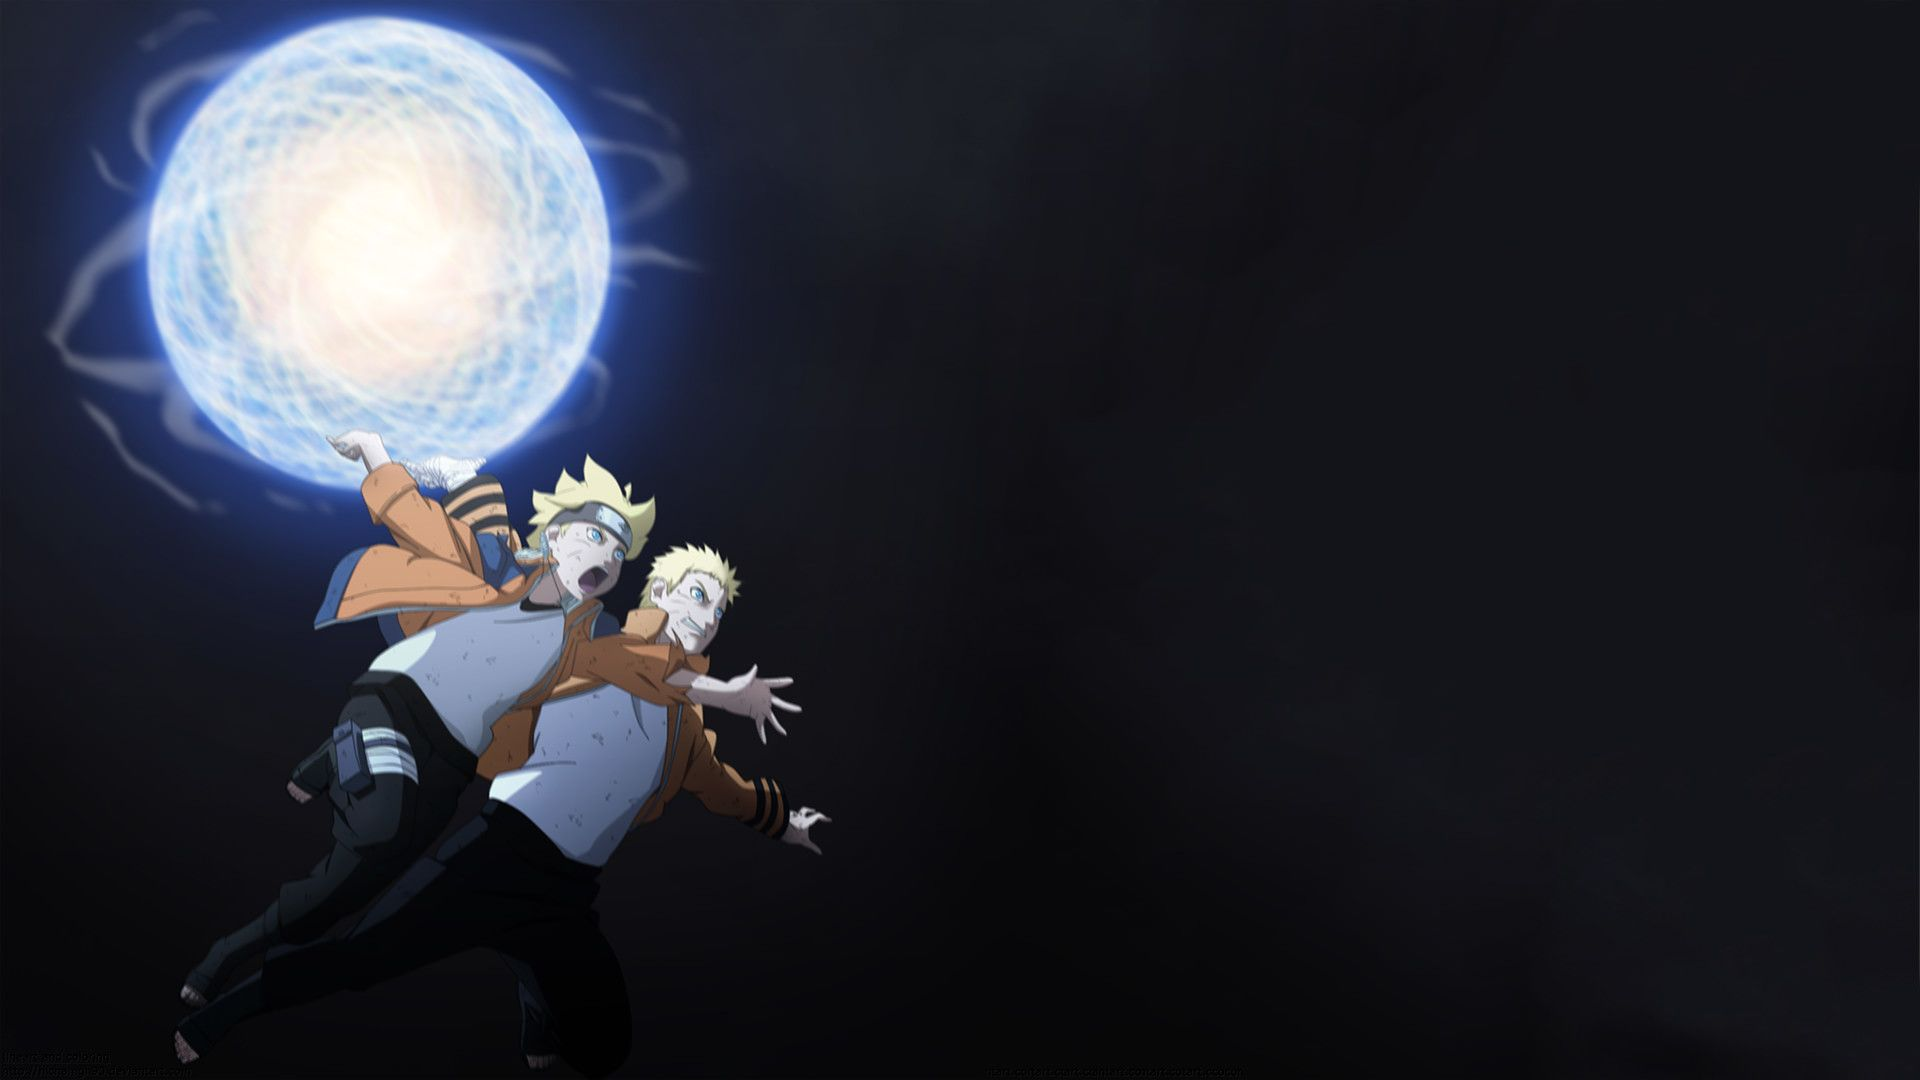 Anime Wallpaper Anime Gambar Naruto Dan Boruto Doraemon Boruto Wallpaper Anime Animasi